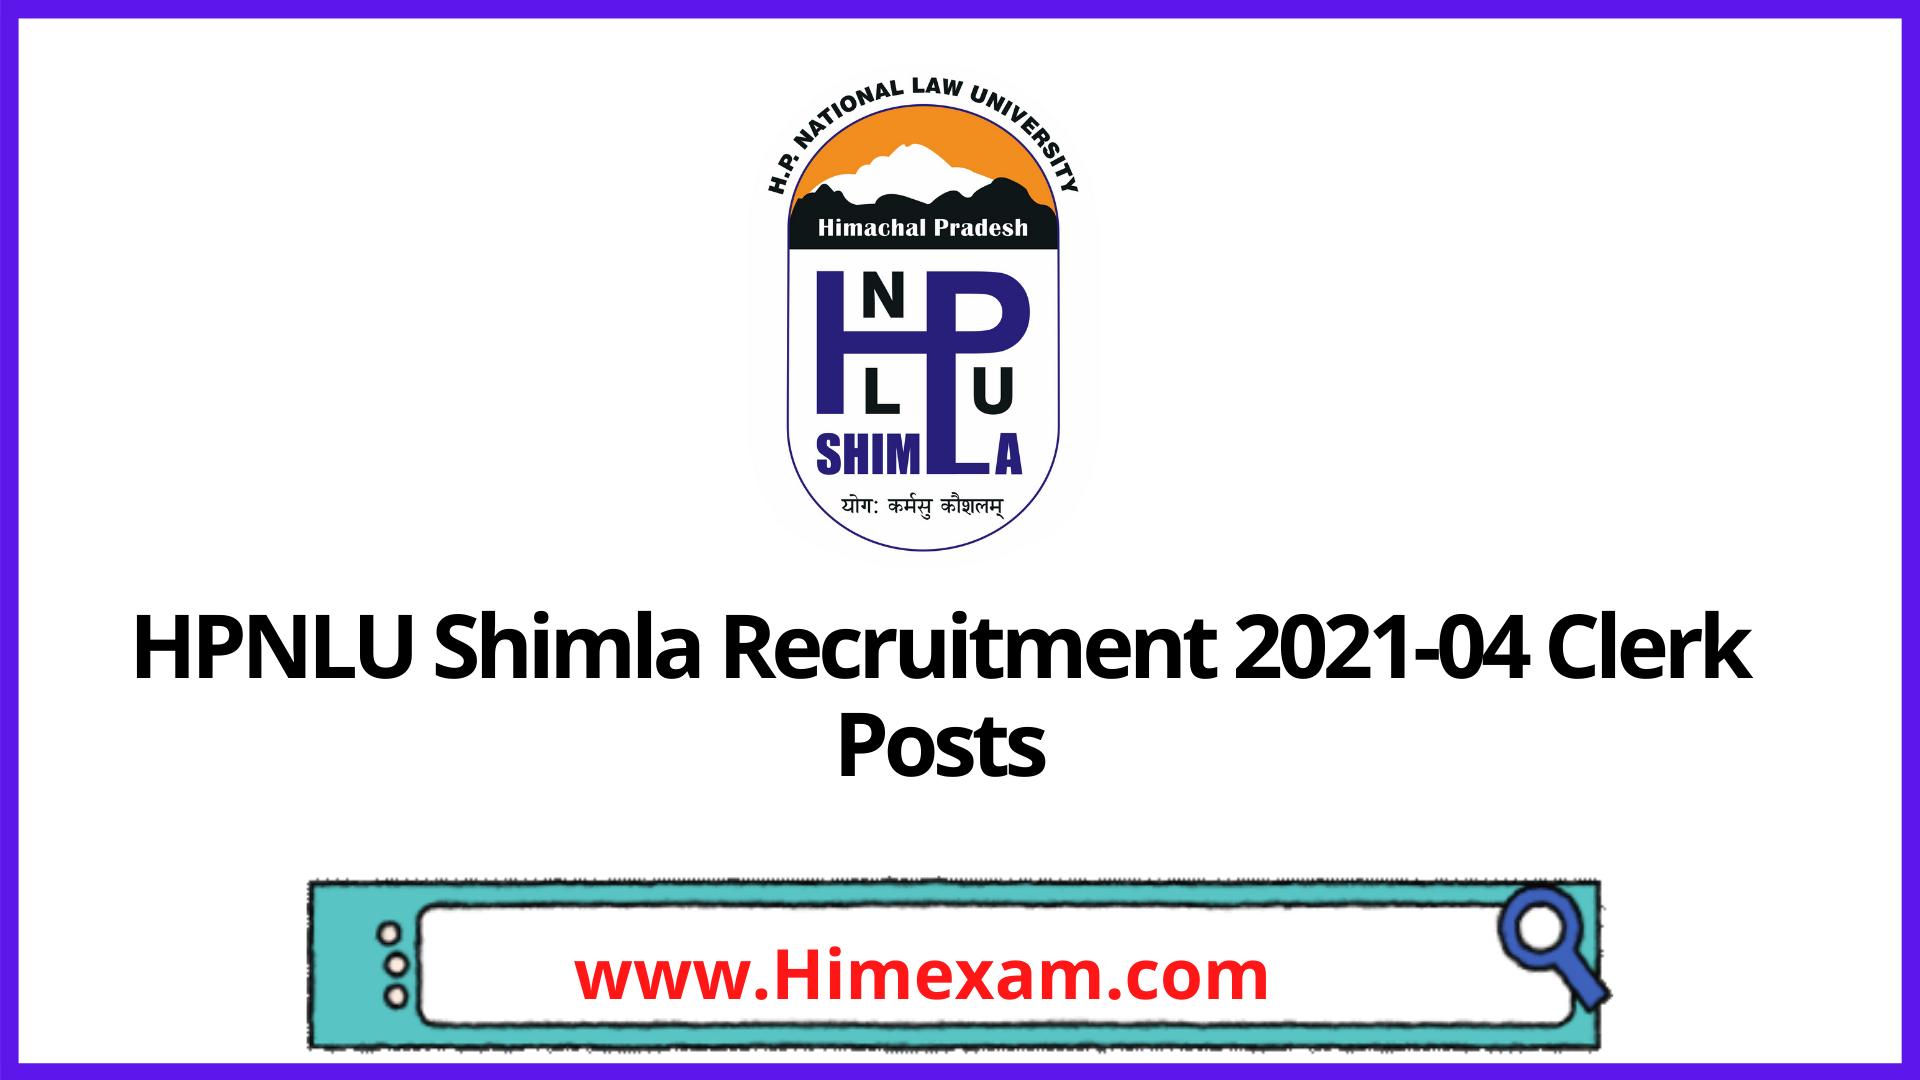 HPNLU Shimla Recruitment 2021-04 Clerk Posts